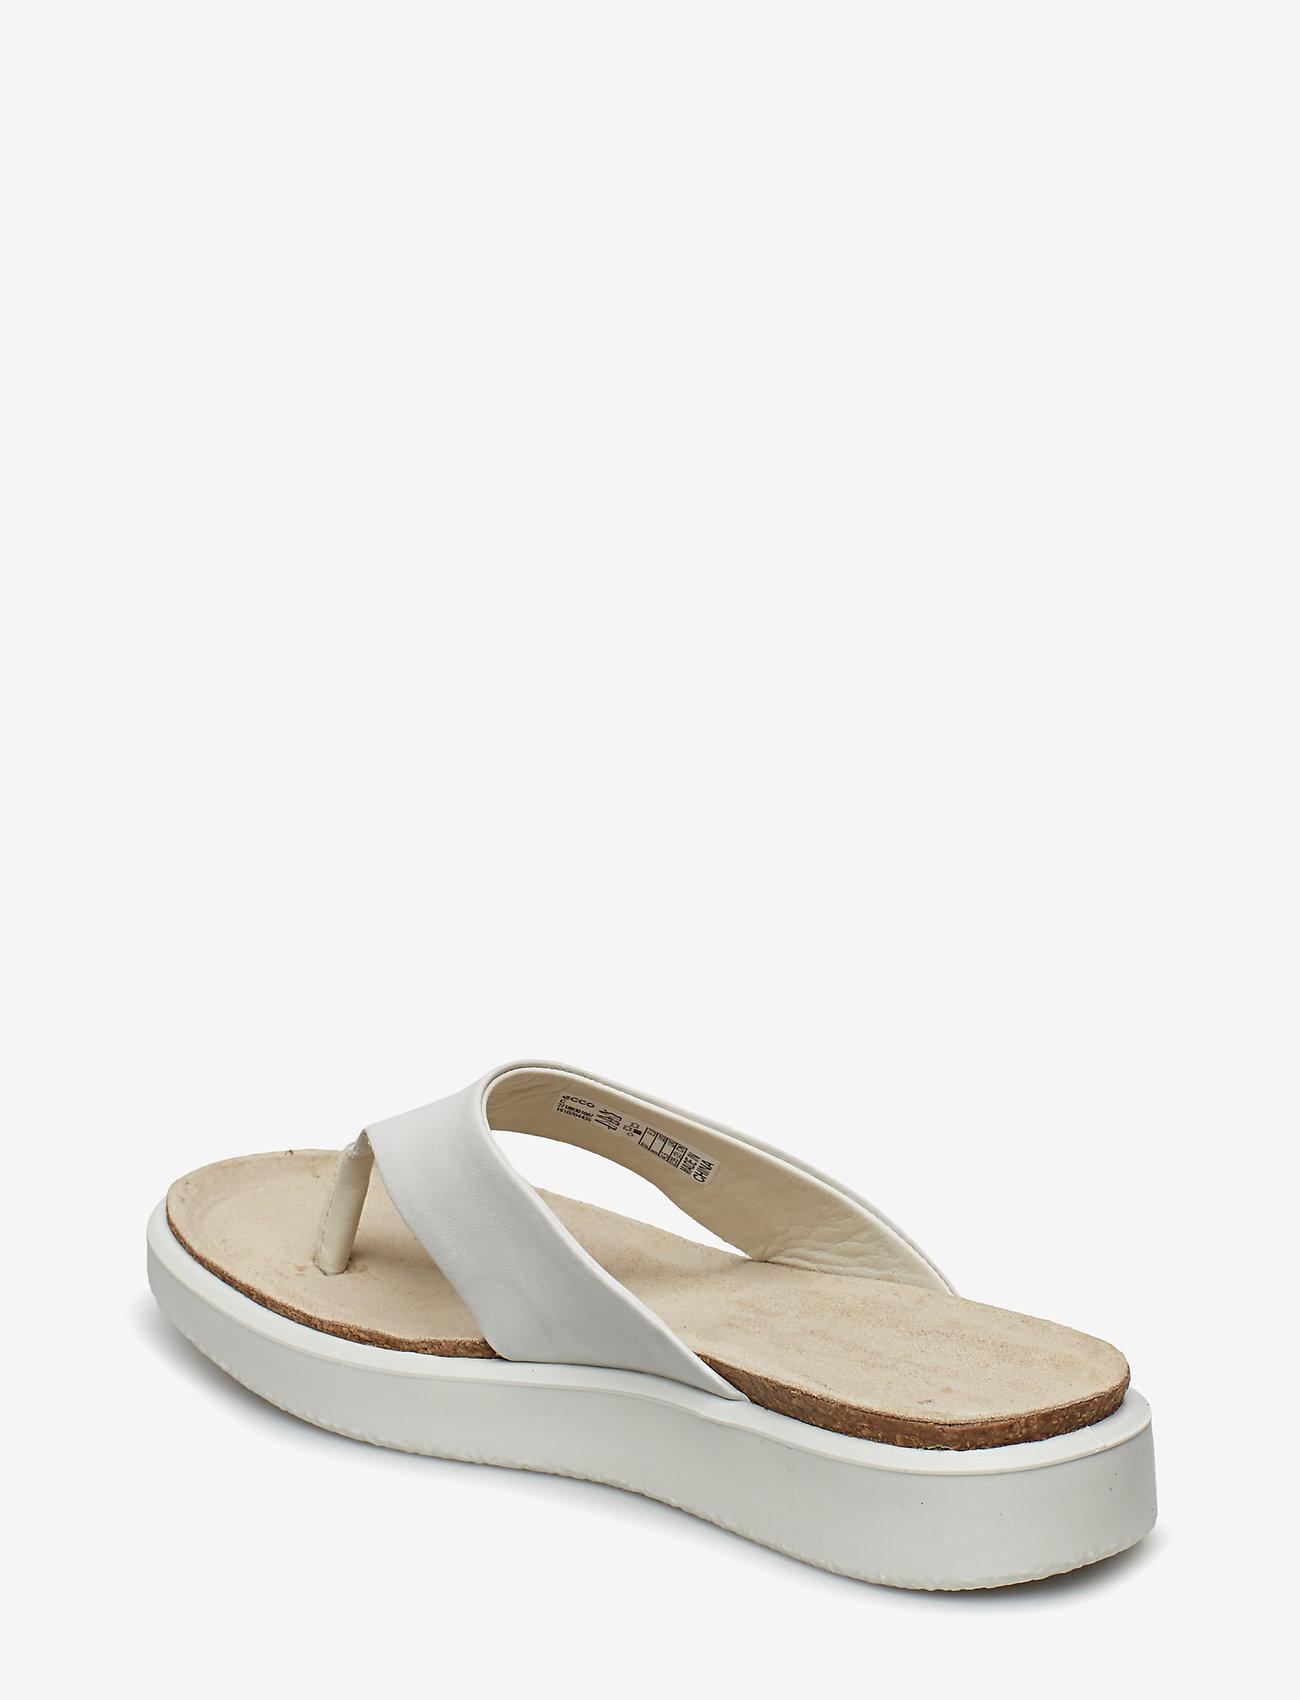 Corksphere Sandal (White) - ECCO